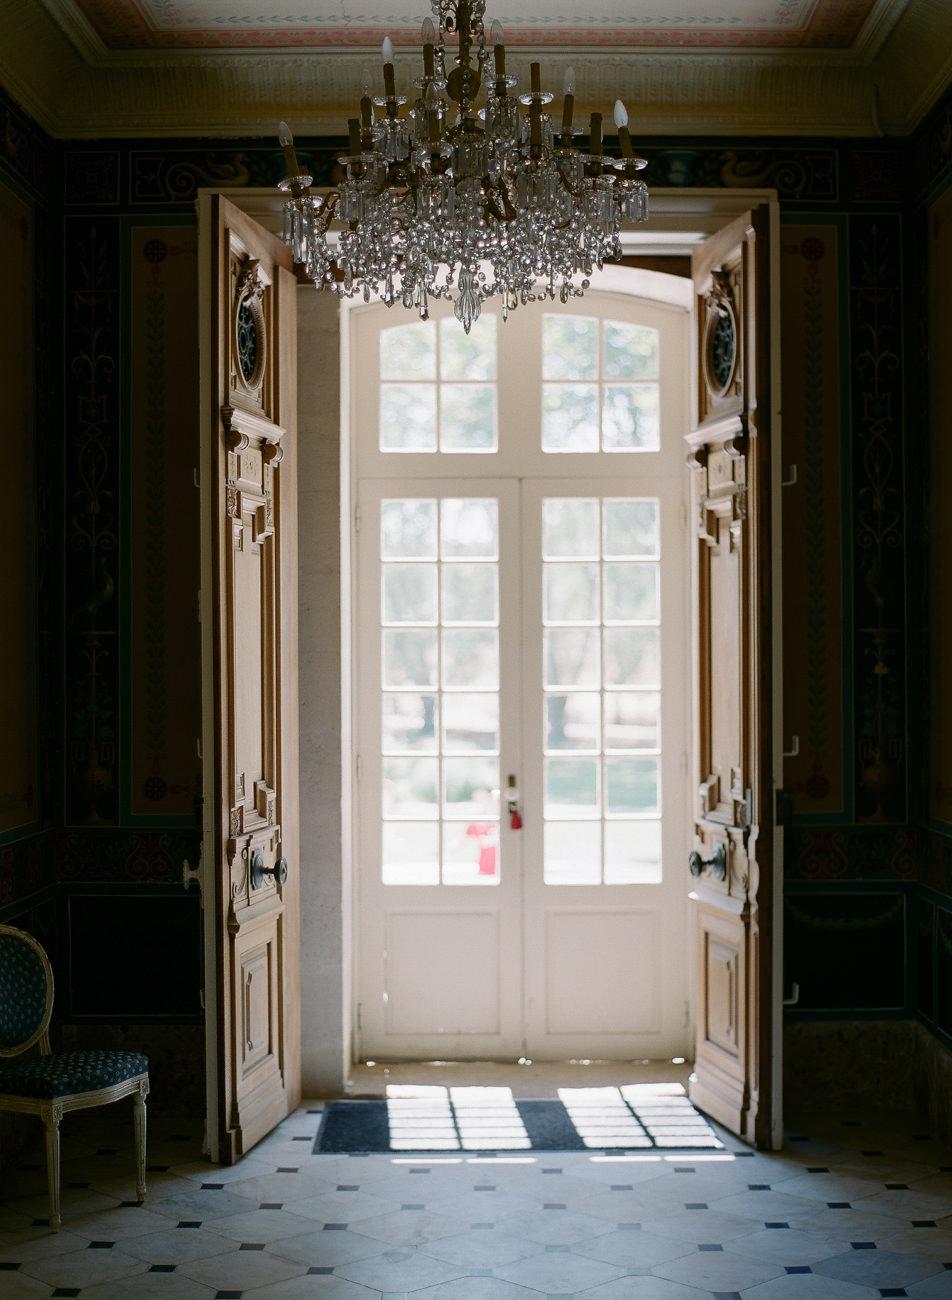 chateau-valmousse-photographe-mariage-alain-m-2.jpg